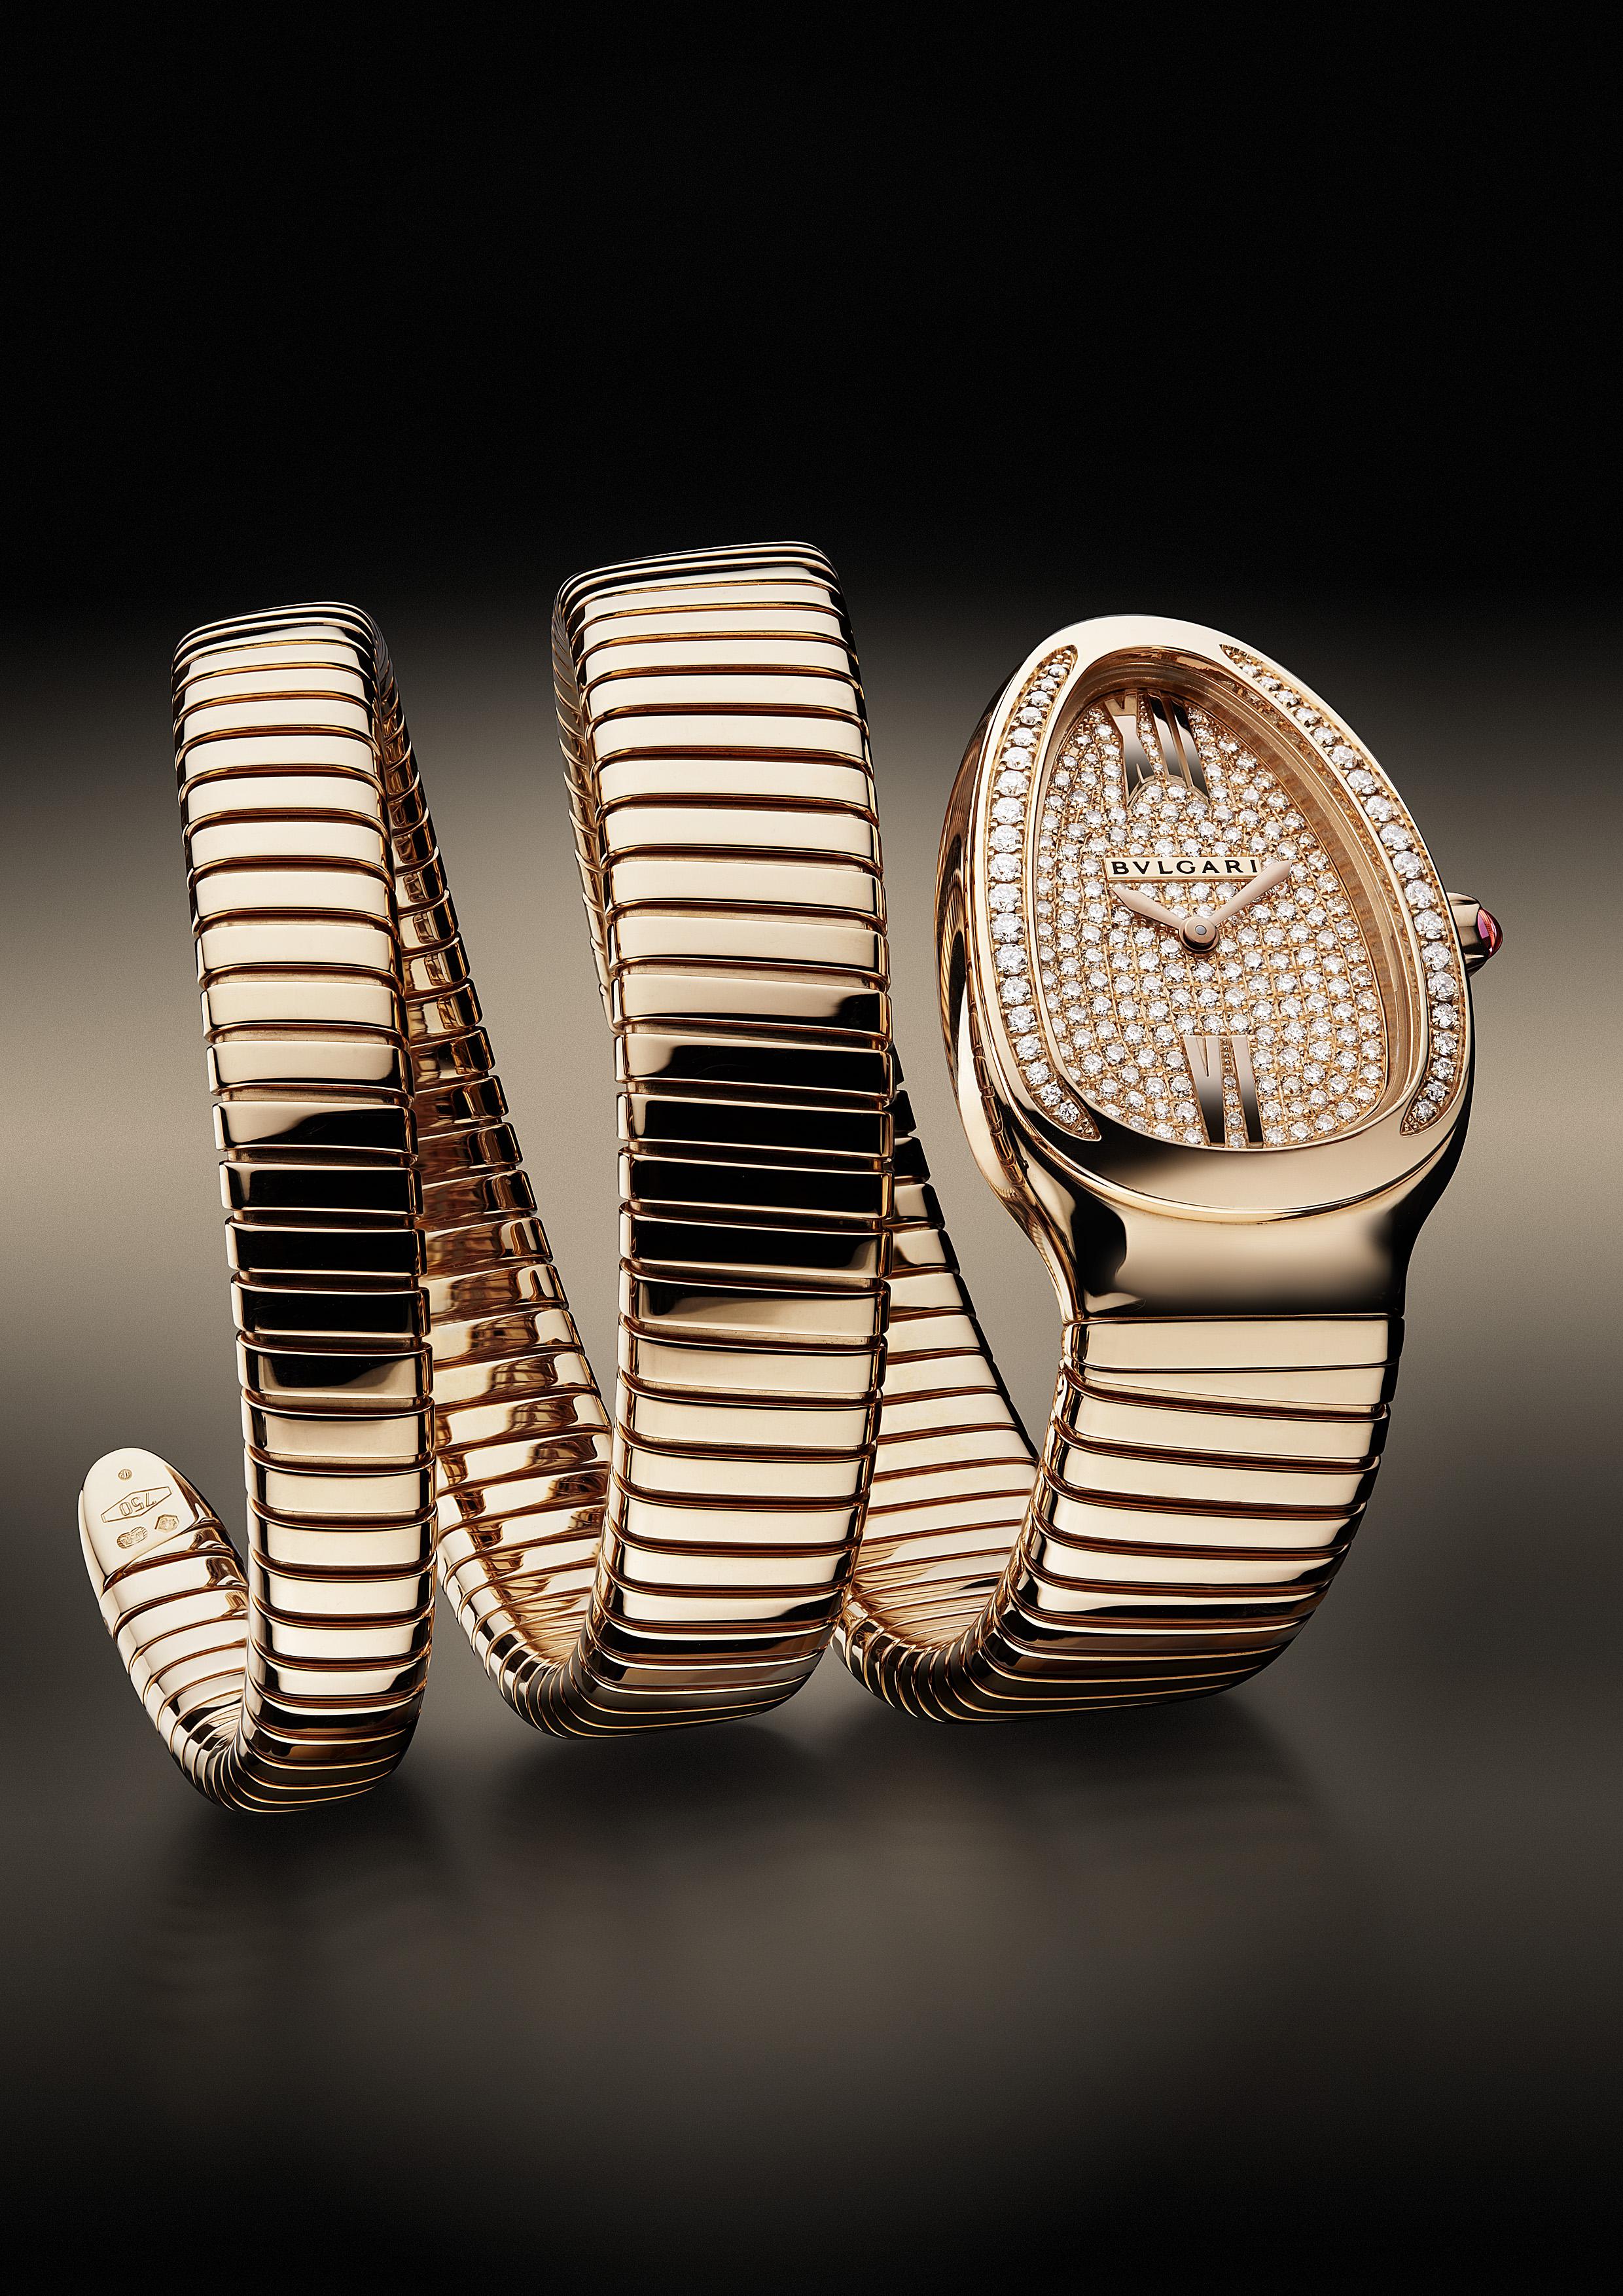 101956- Serpenti watch,35mm, pink gold-diamonds case, Gold -full setting dial, Quartz movement, Diamonds 228 pce, Weight diamonds 1.11 [ct], Weight precious metall 125